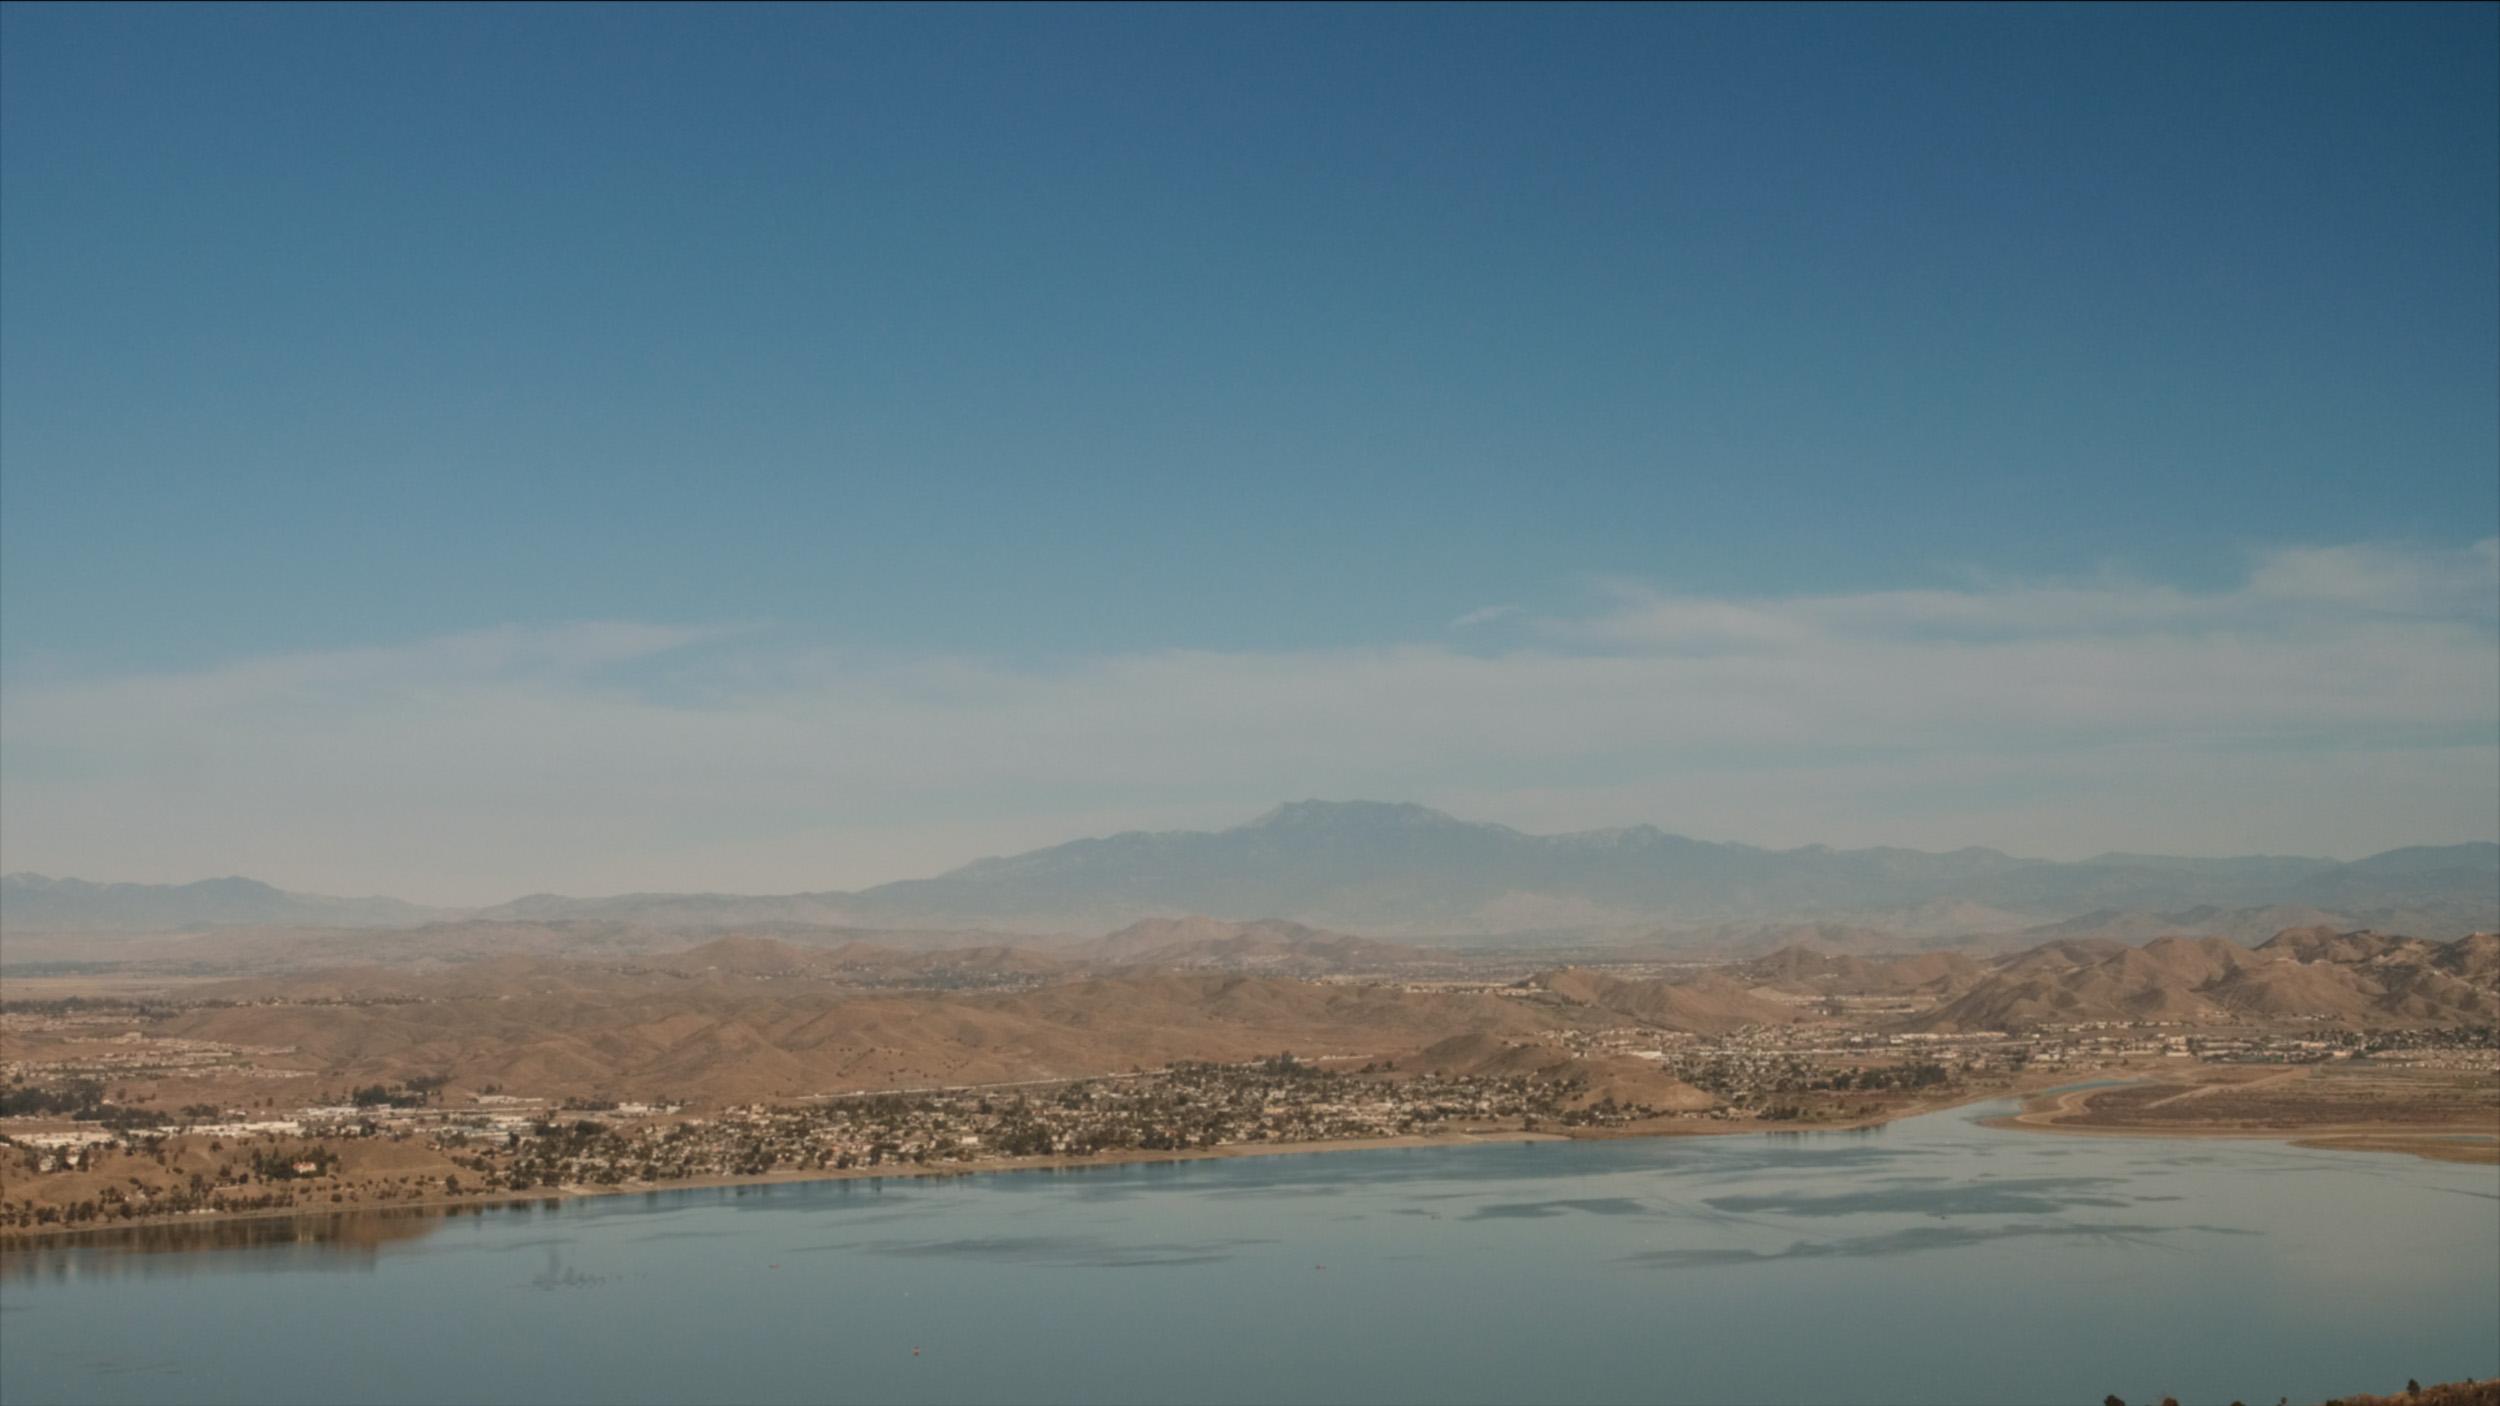 lake view by jevgenij tichonov.jpg